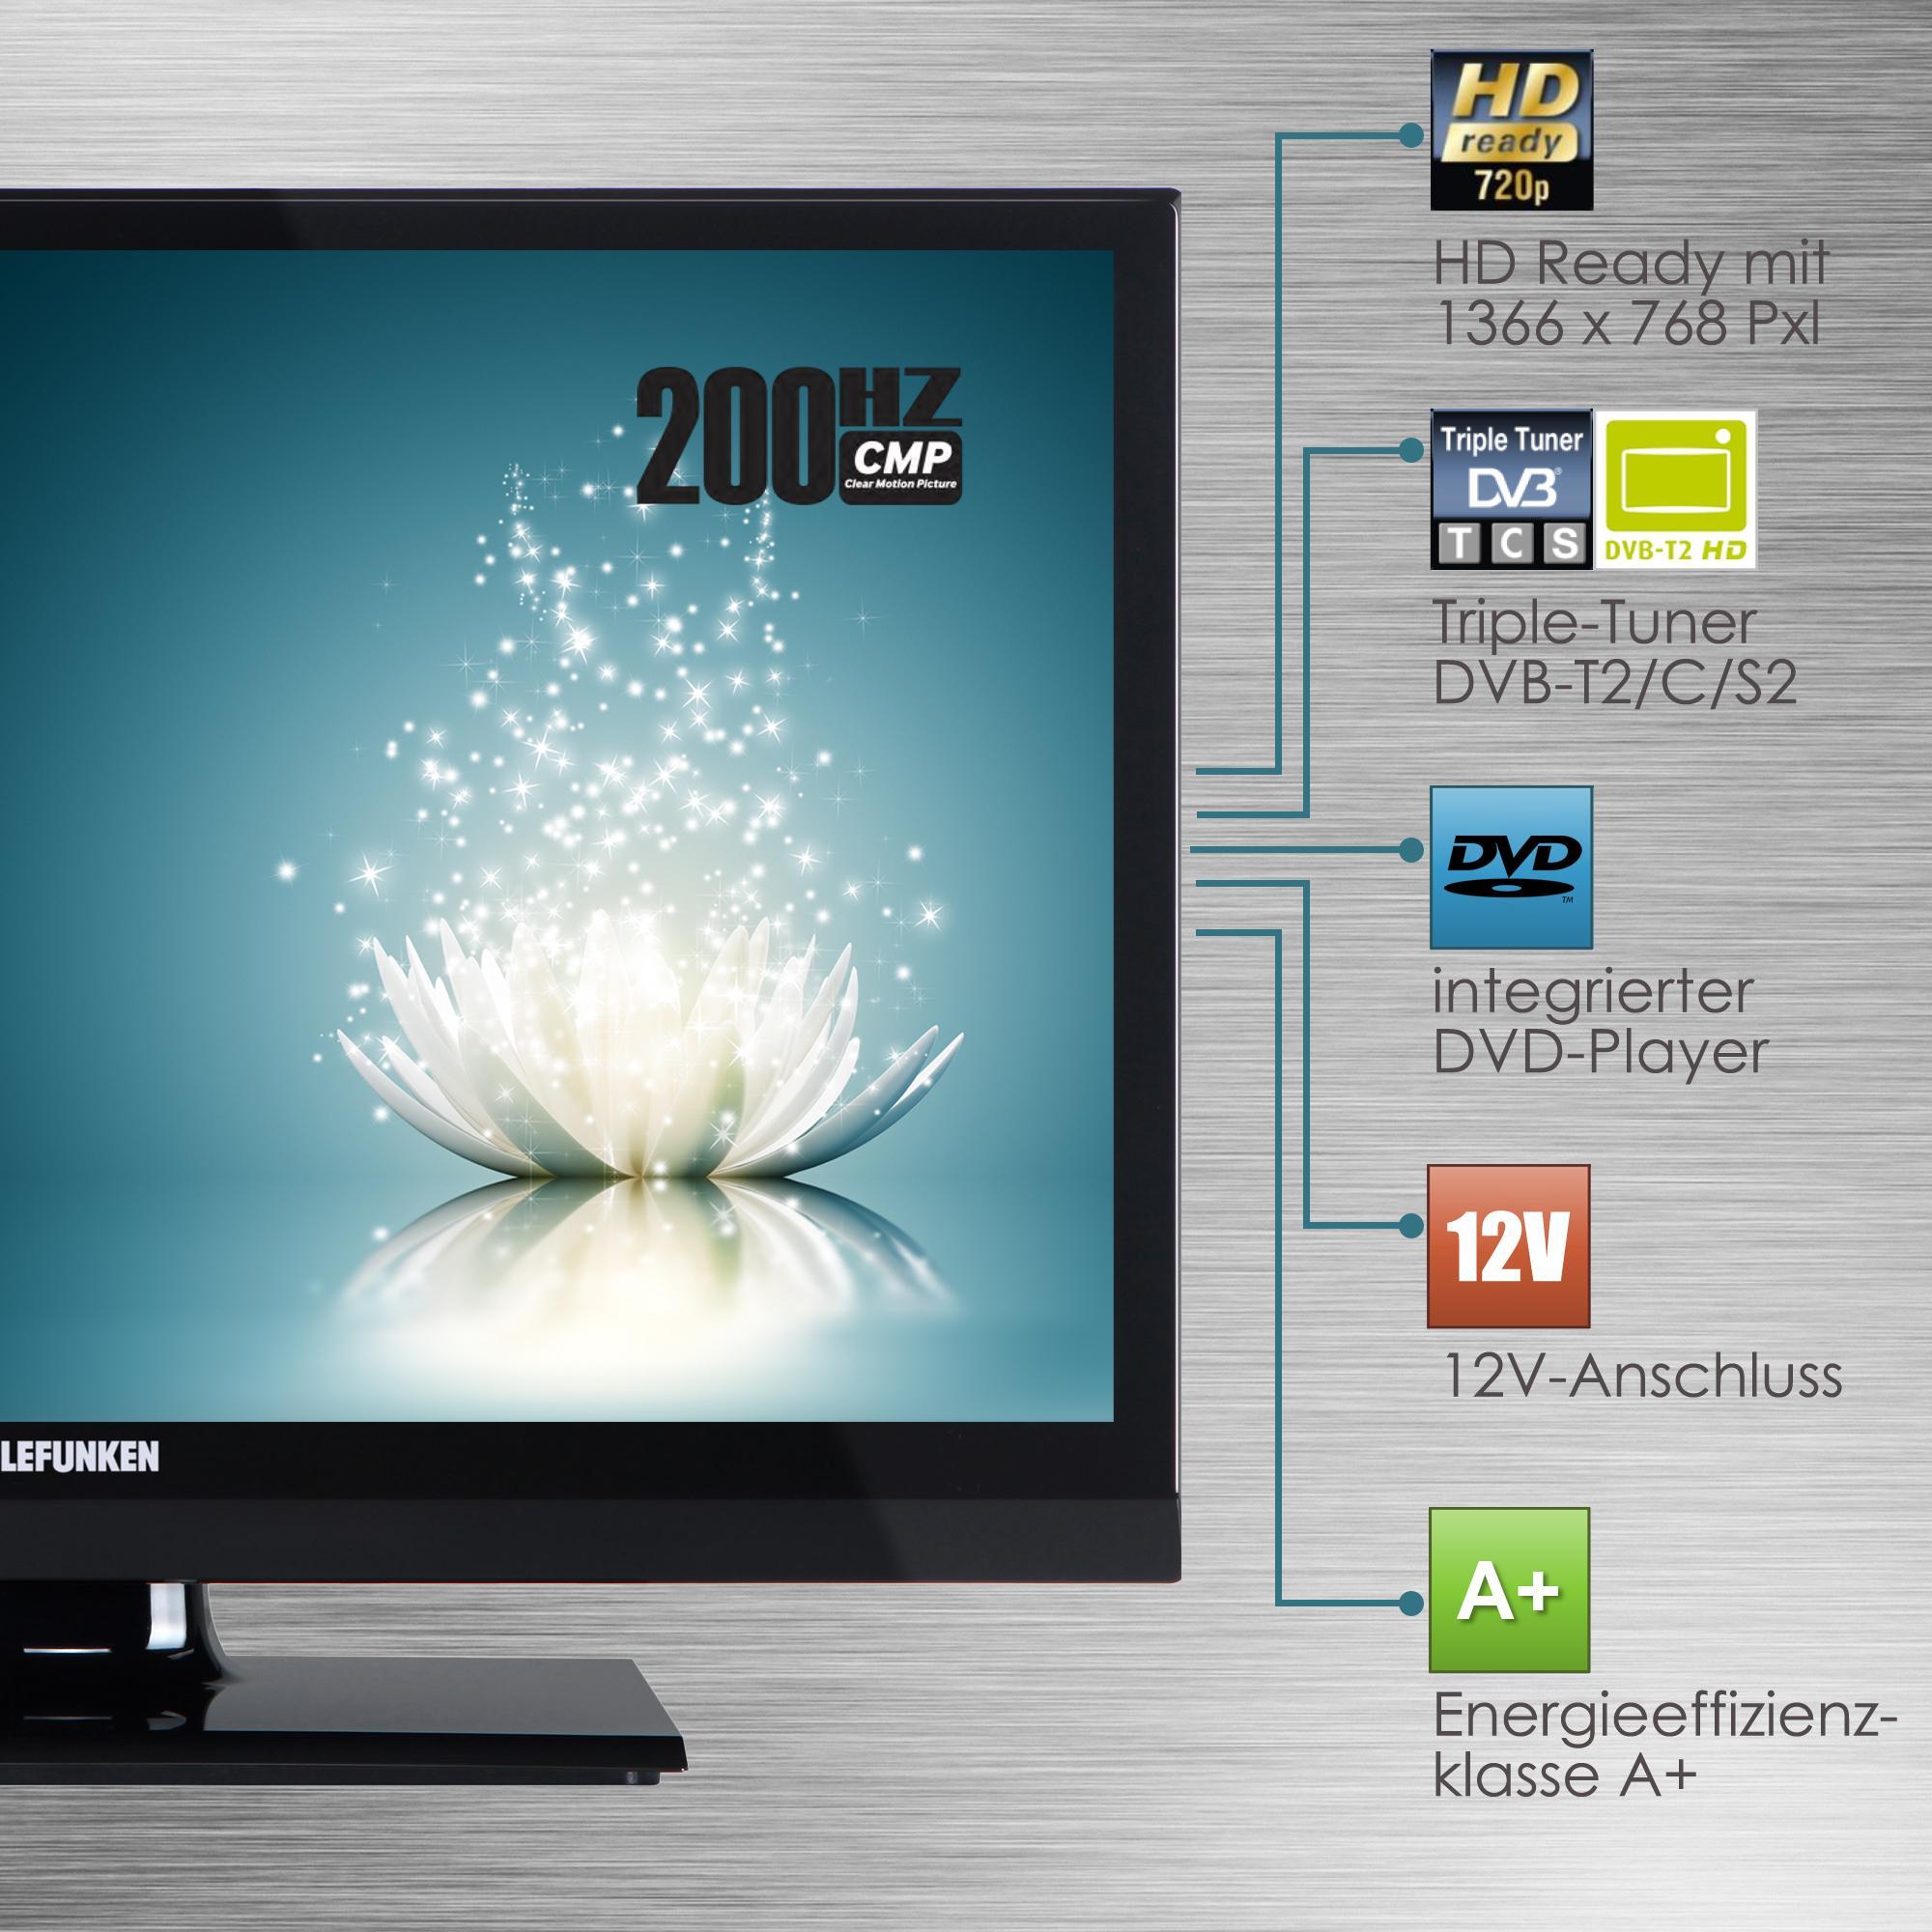 Telefunken XH20A101VD 51 cm (20 Zoll) Fernseher (HD-ready